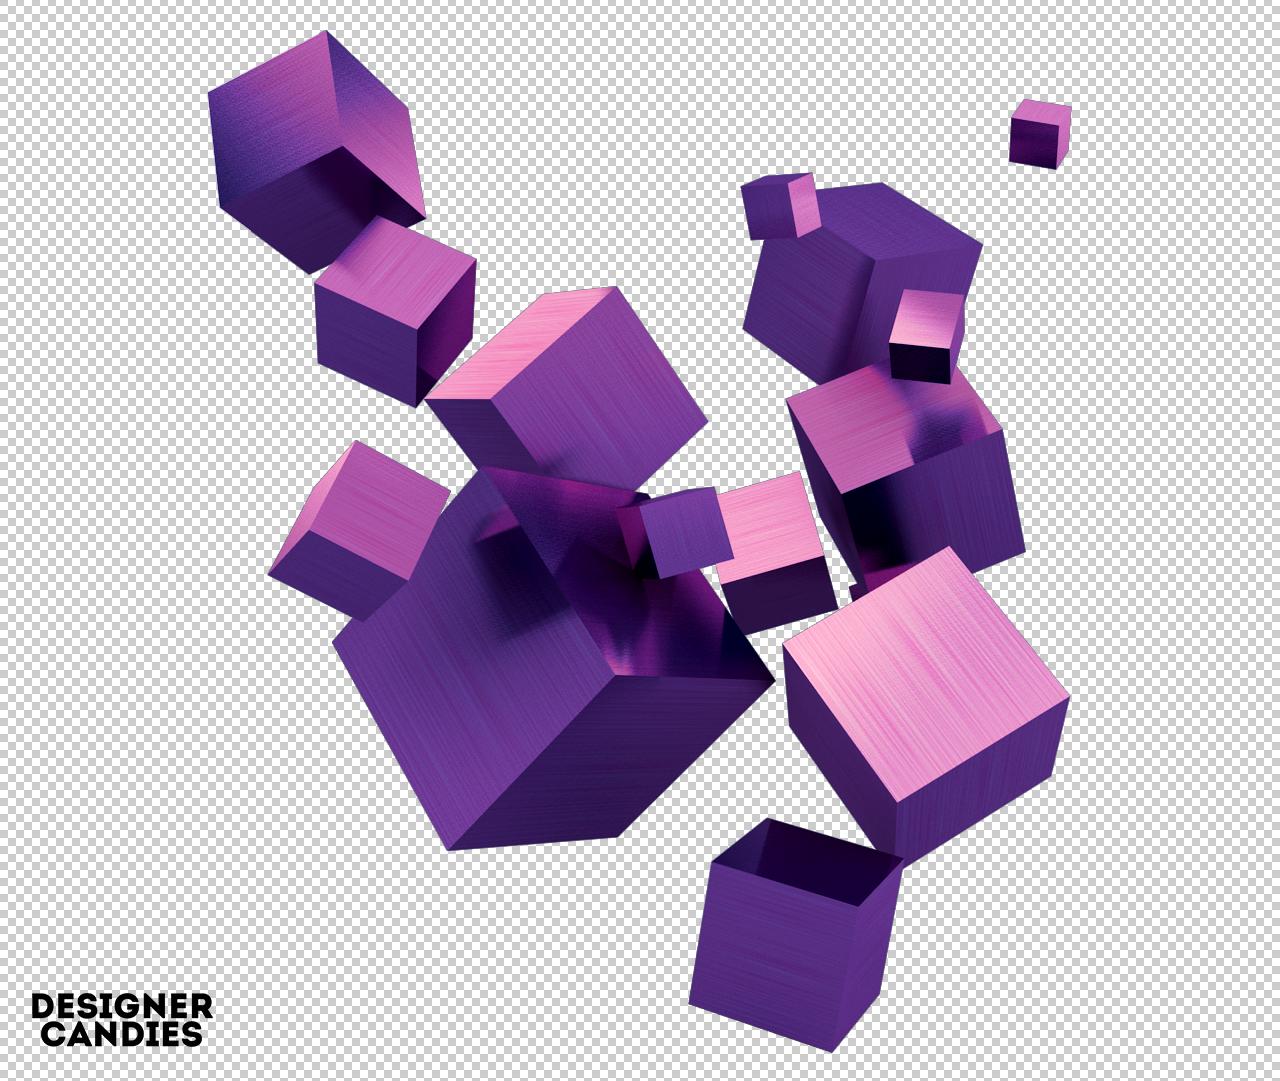 Free 3d Cube Clusters Designercandies Design Freebie Cube 3d Cube